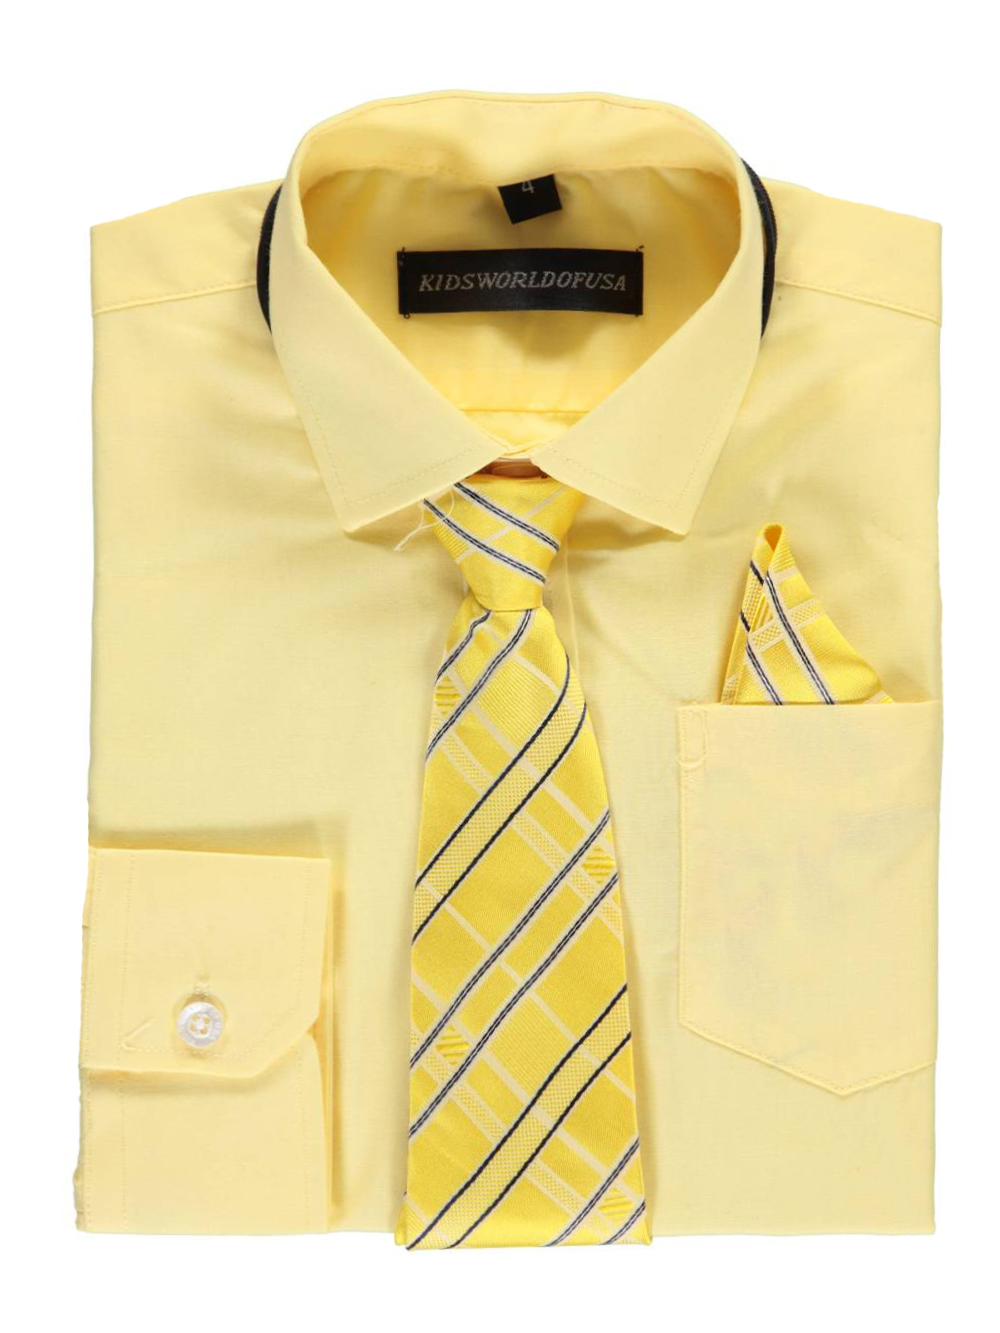 Kids World Little Boys' Dress Shirt with Accessories (Sizes 4 - 7) - yellow, 5